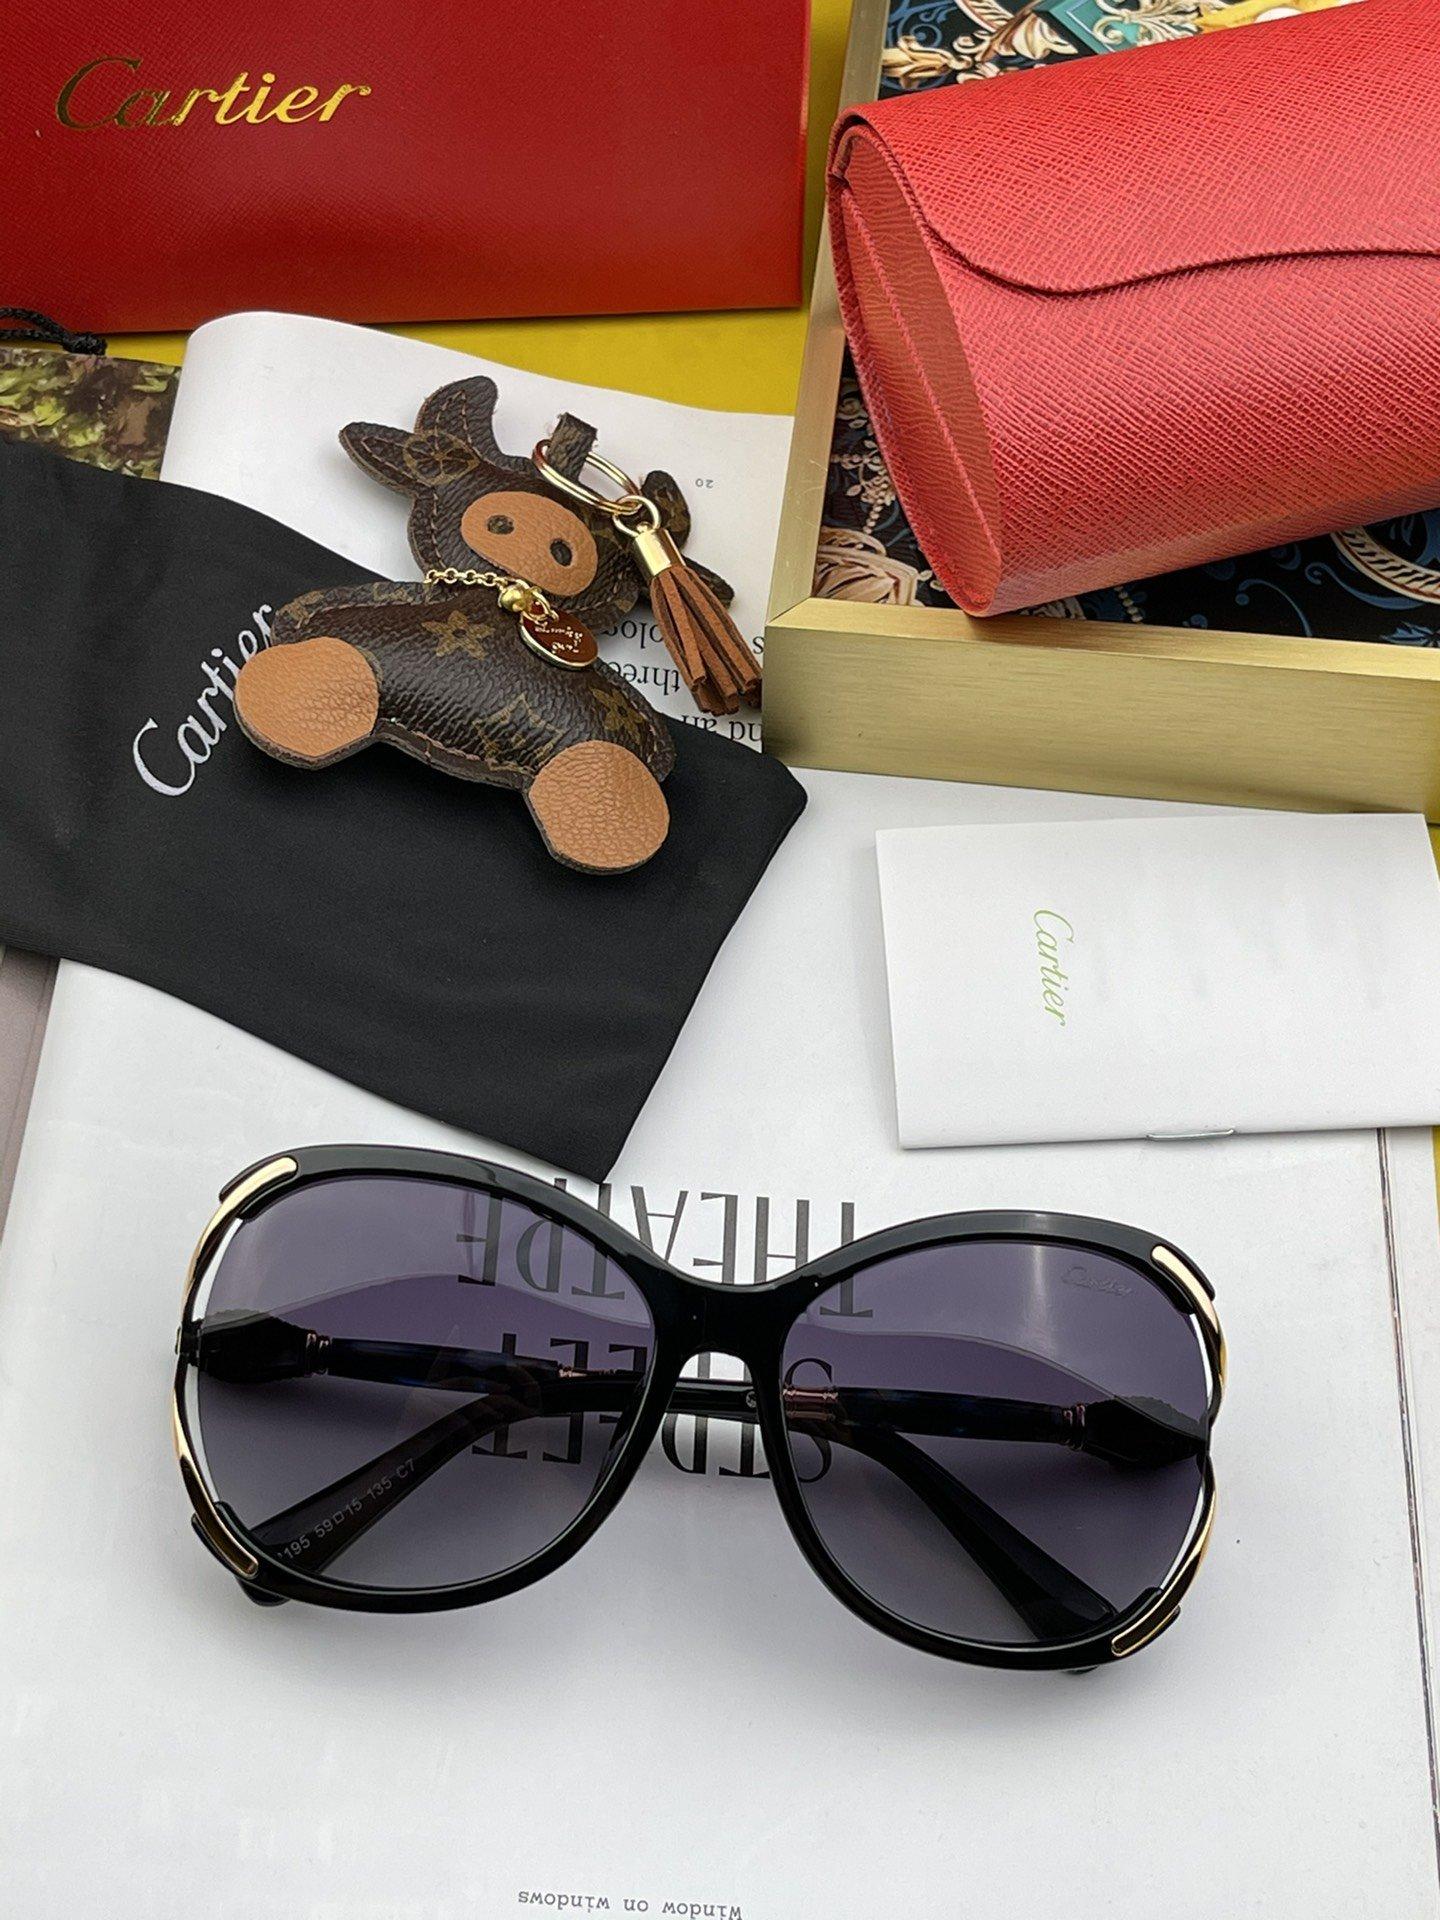 Cartier卡地亚新款高品质看细节